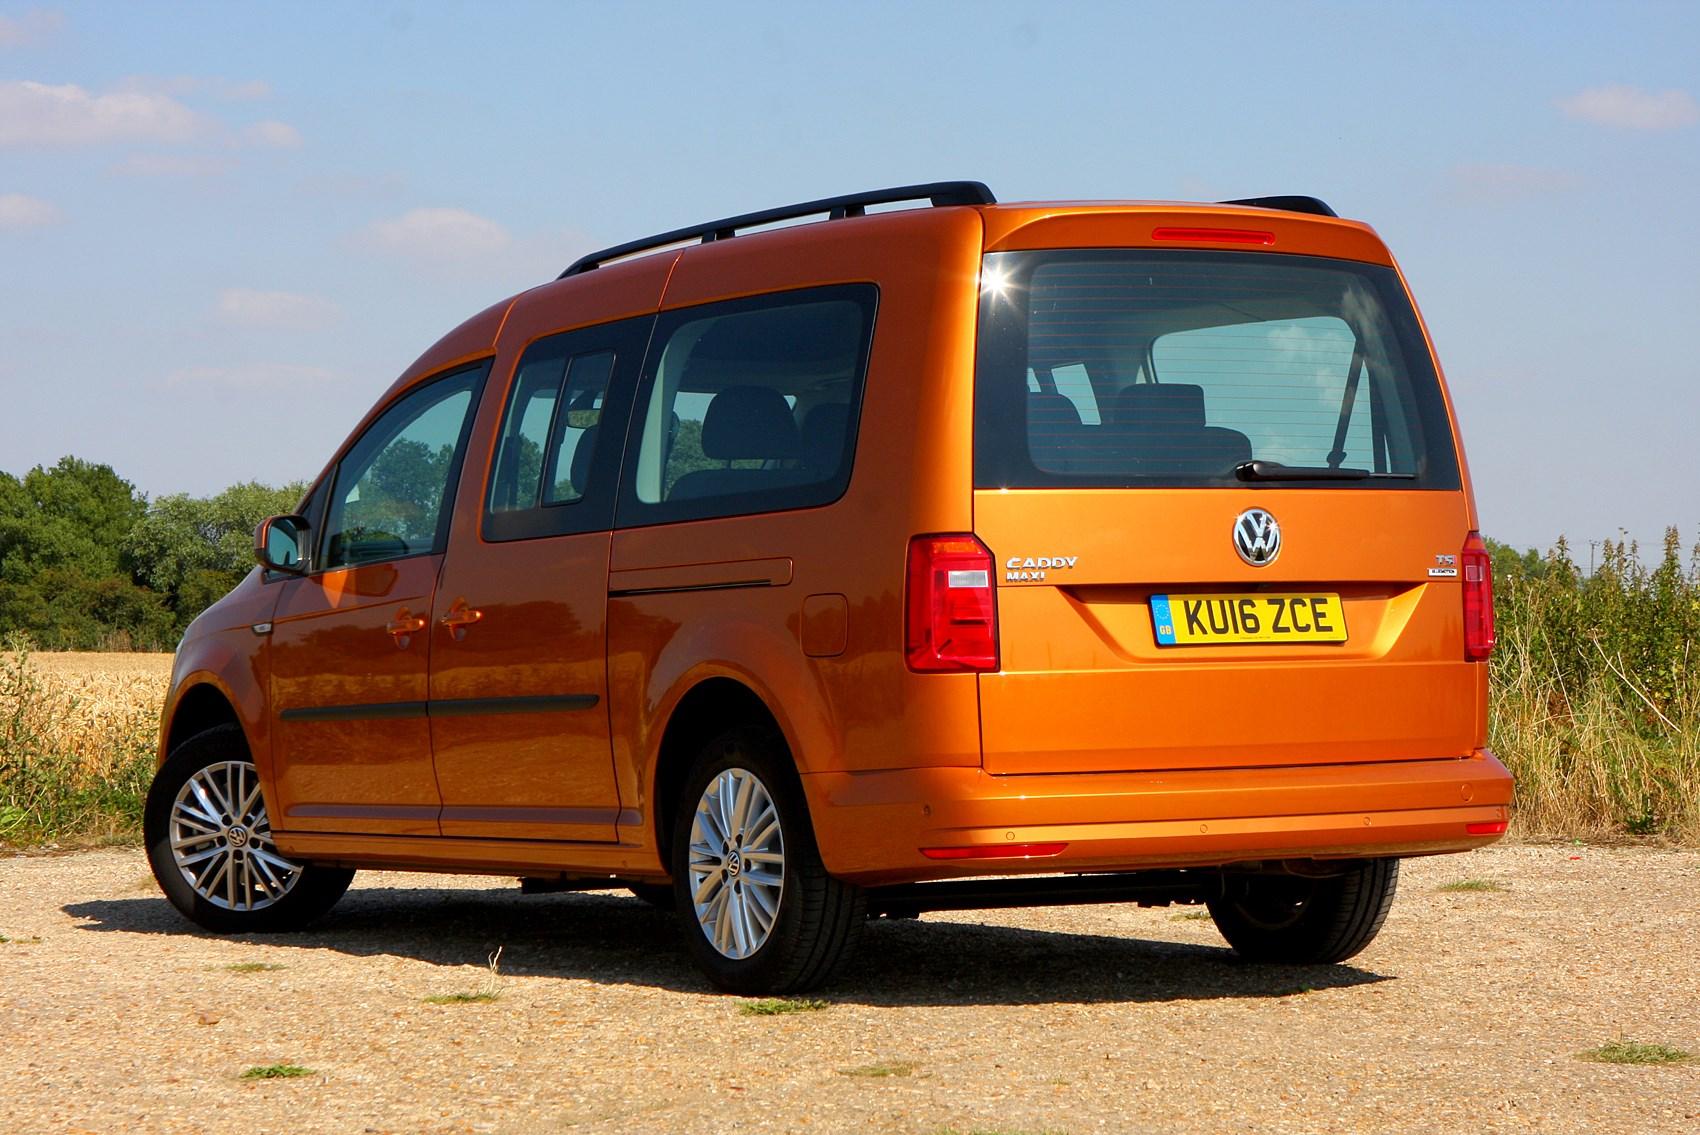 volkswagen caddy review maxi life 4motion dsg reviews. Black Bedroom Furniture Sets. Home Design Ideas